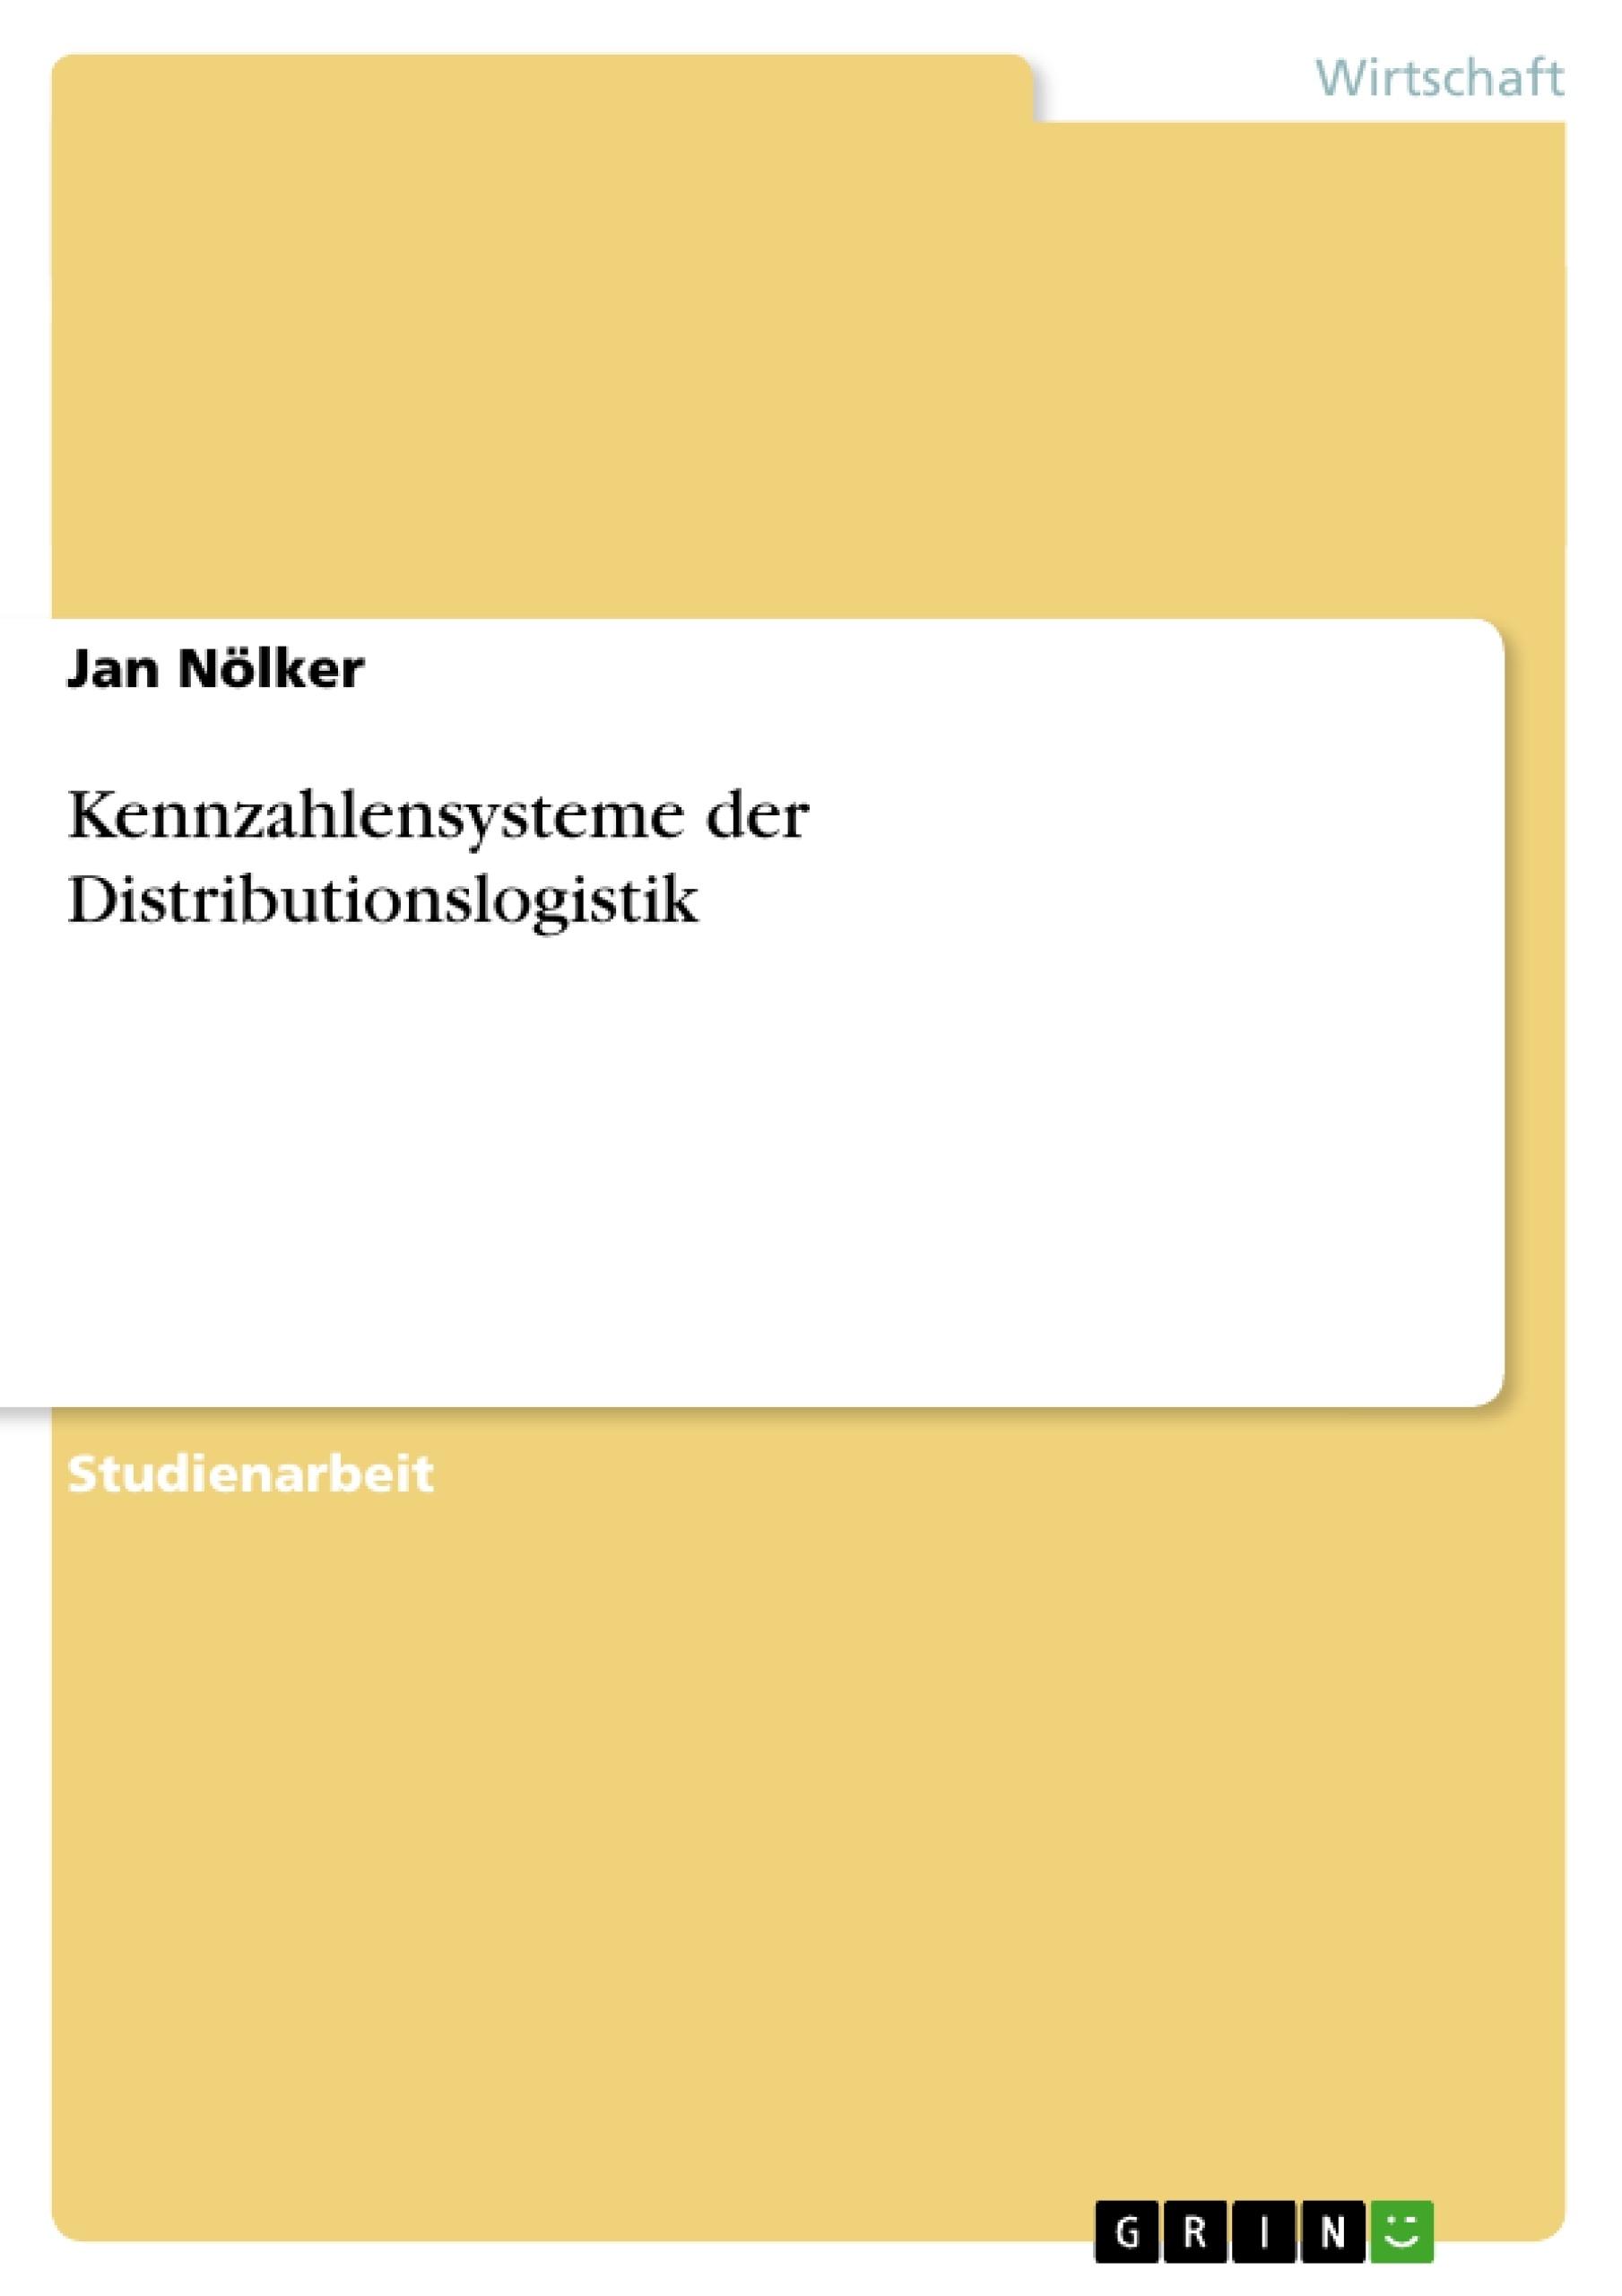 Titel: Kennzahlensysteme der Distributionslogistik